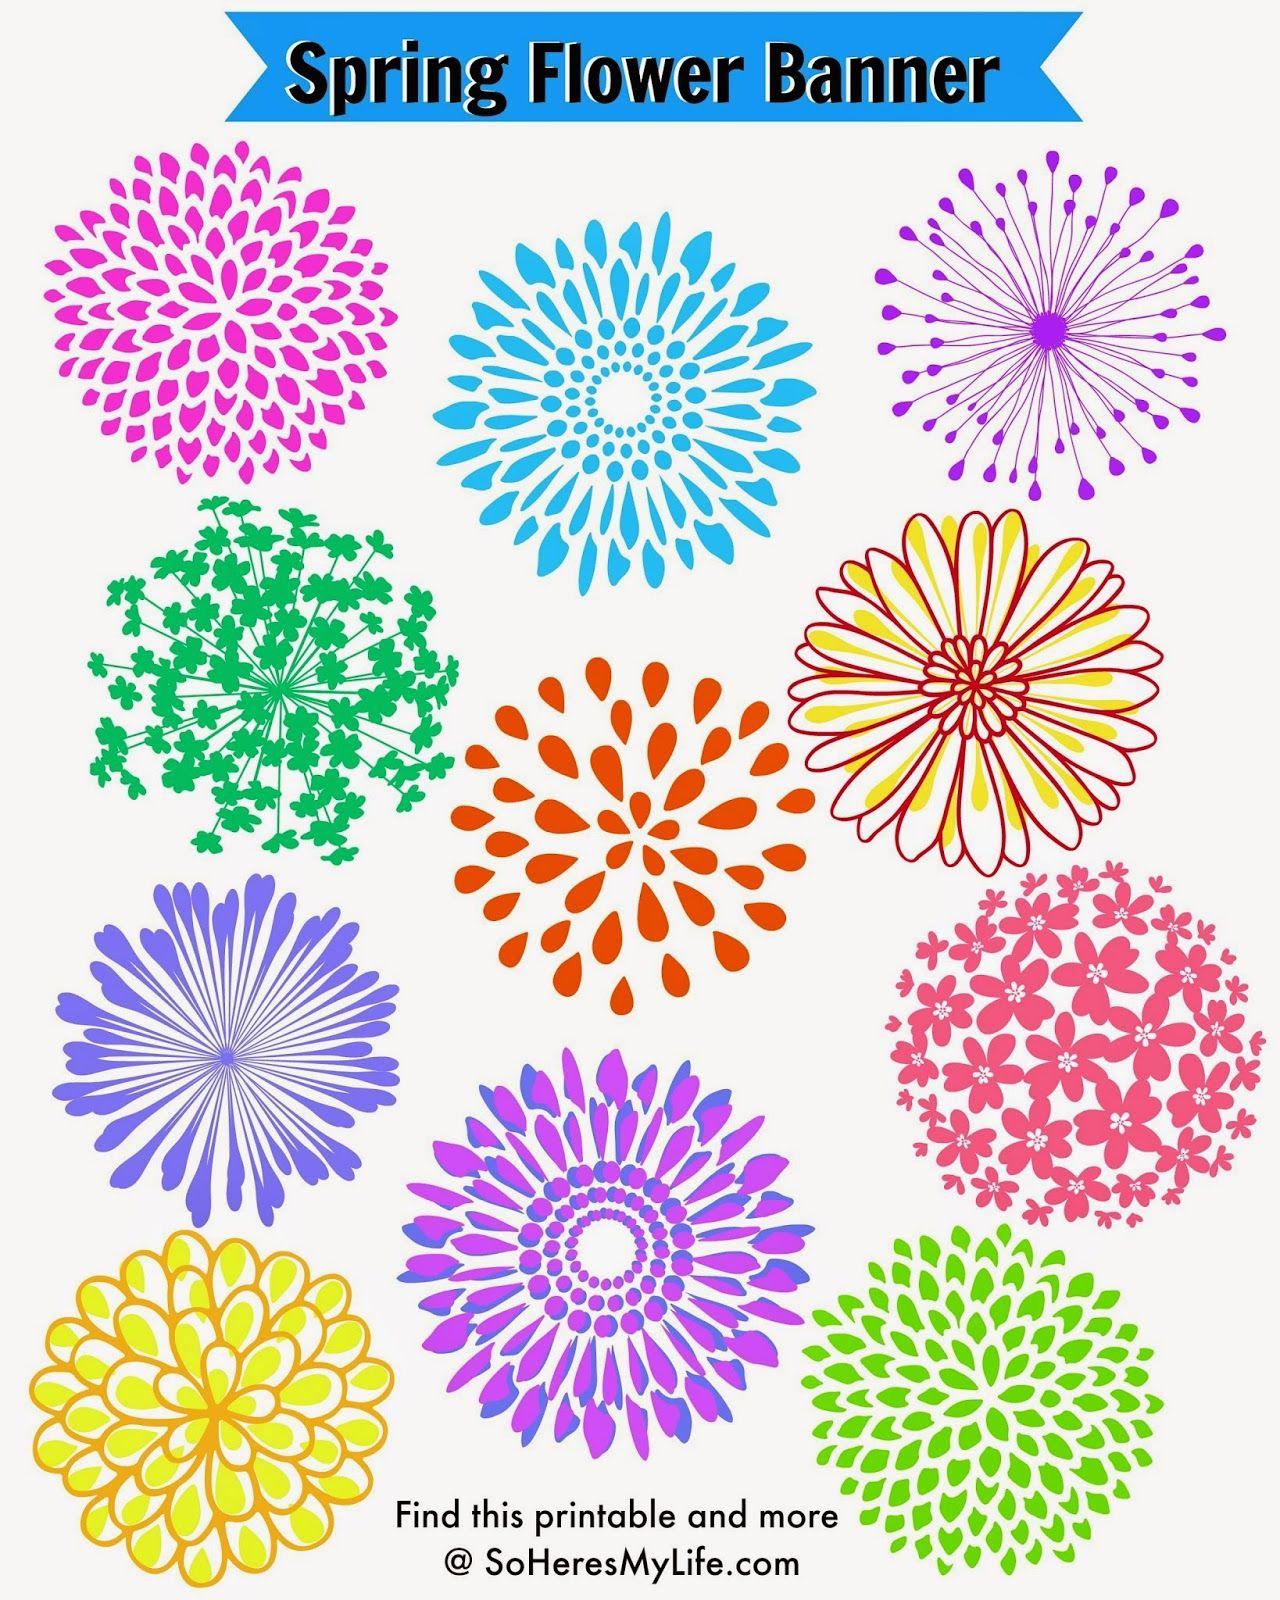 Printable Spring Flower Banner